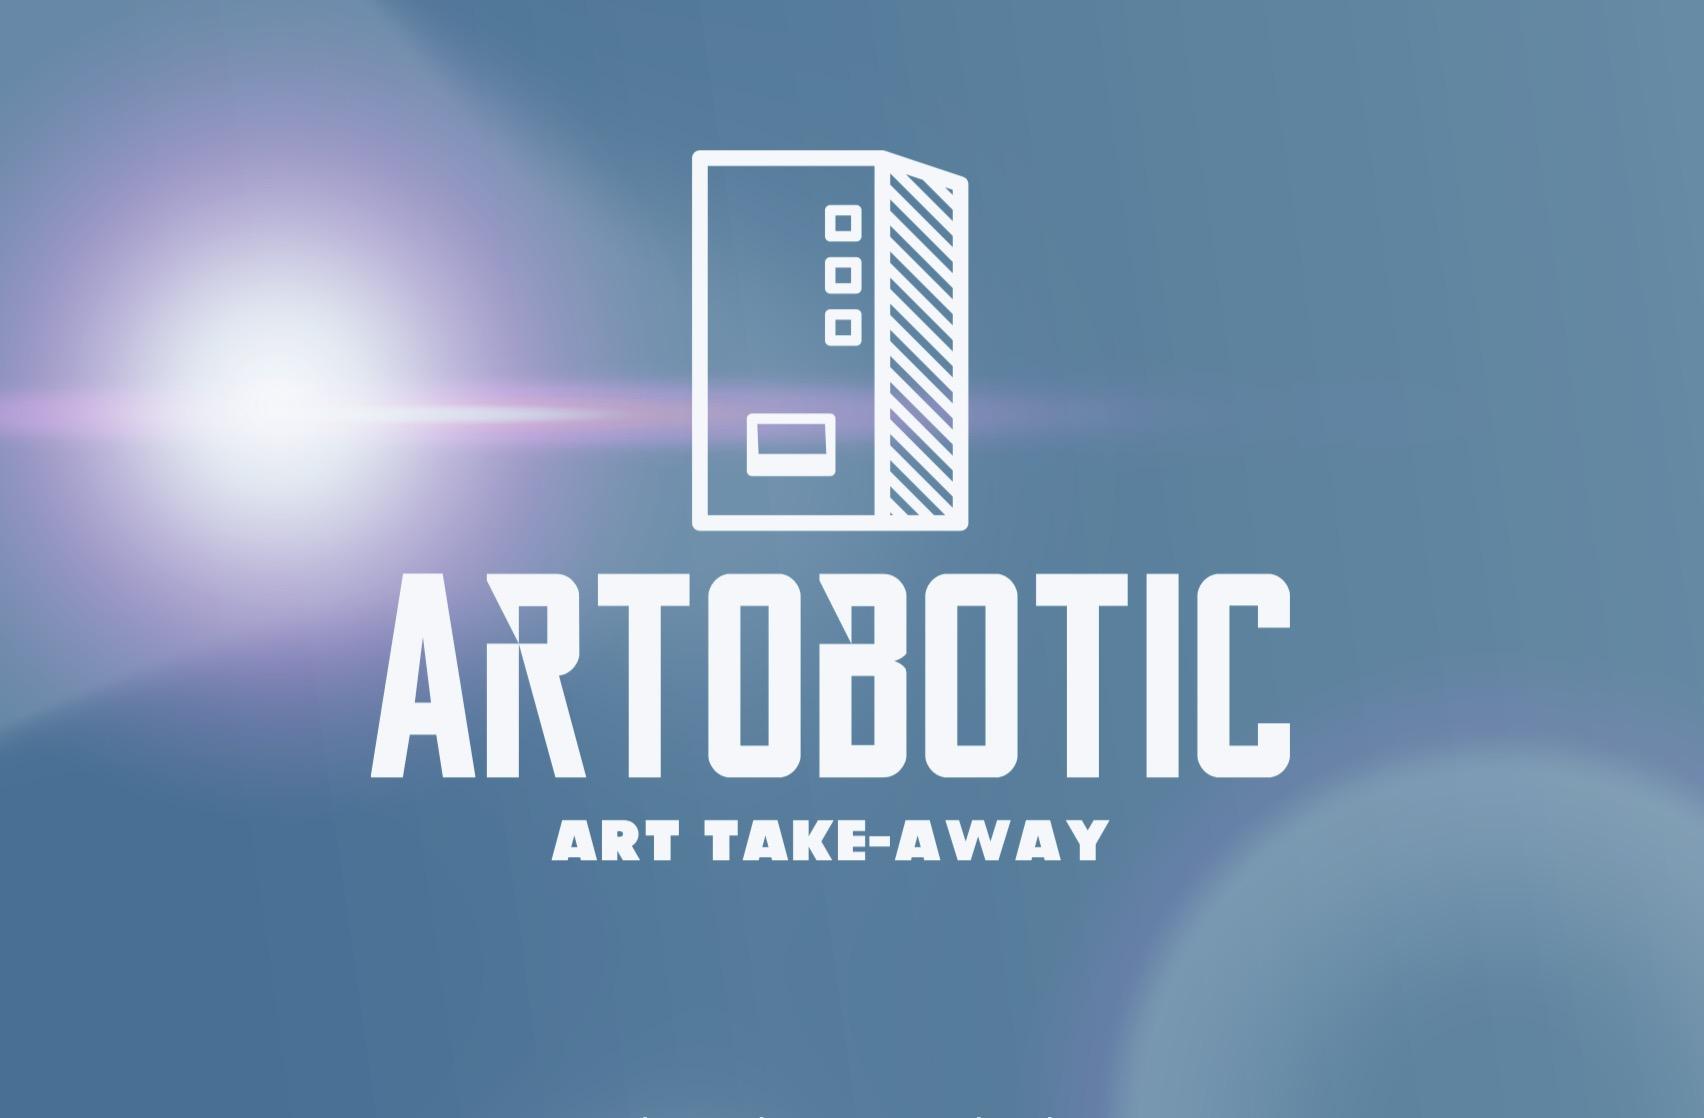 Artobotic, art vending machine